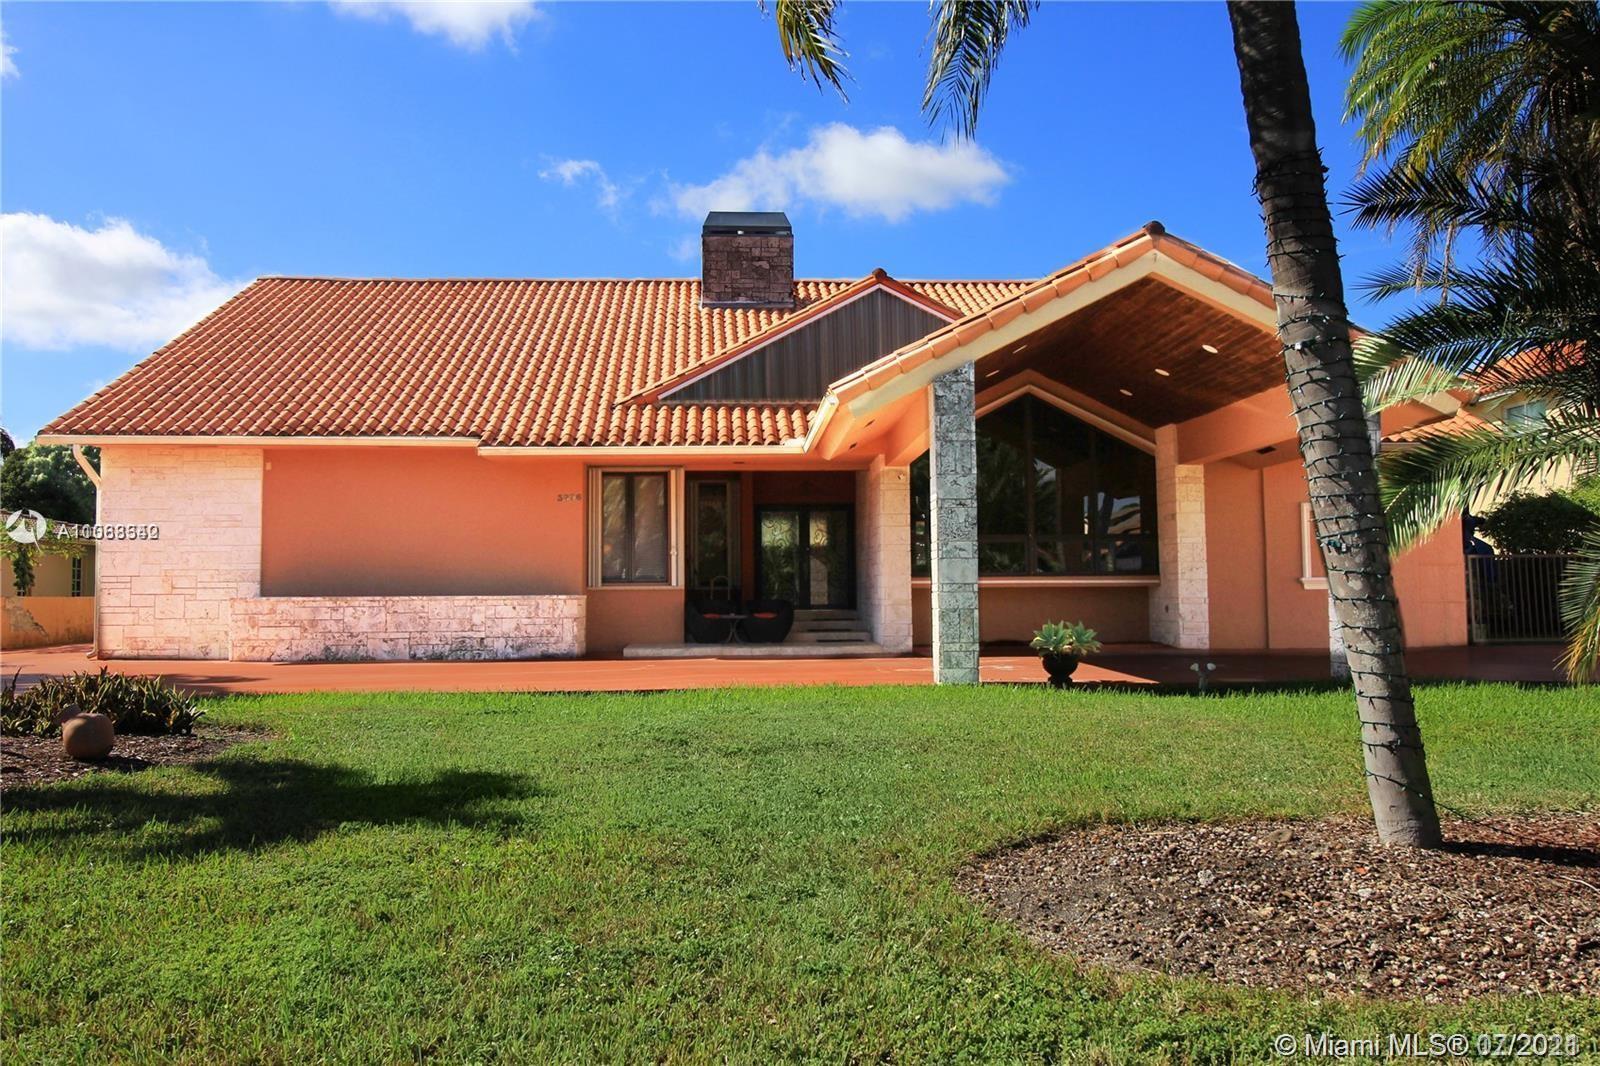 J G Heads Farms - 3996 SW 128th Ave, Miami, FL 33175